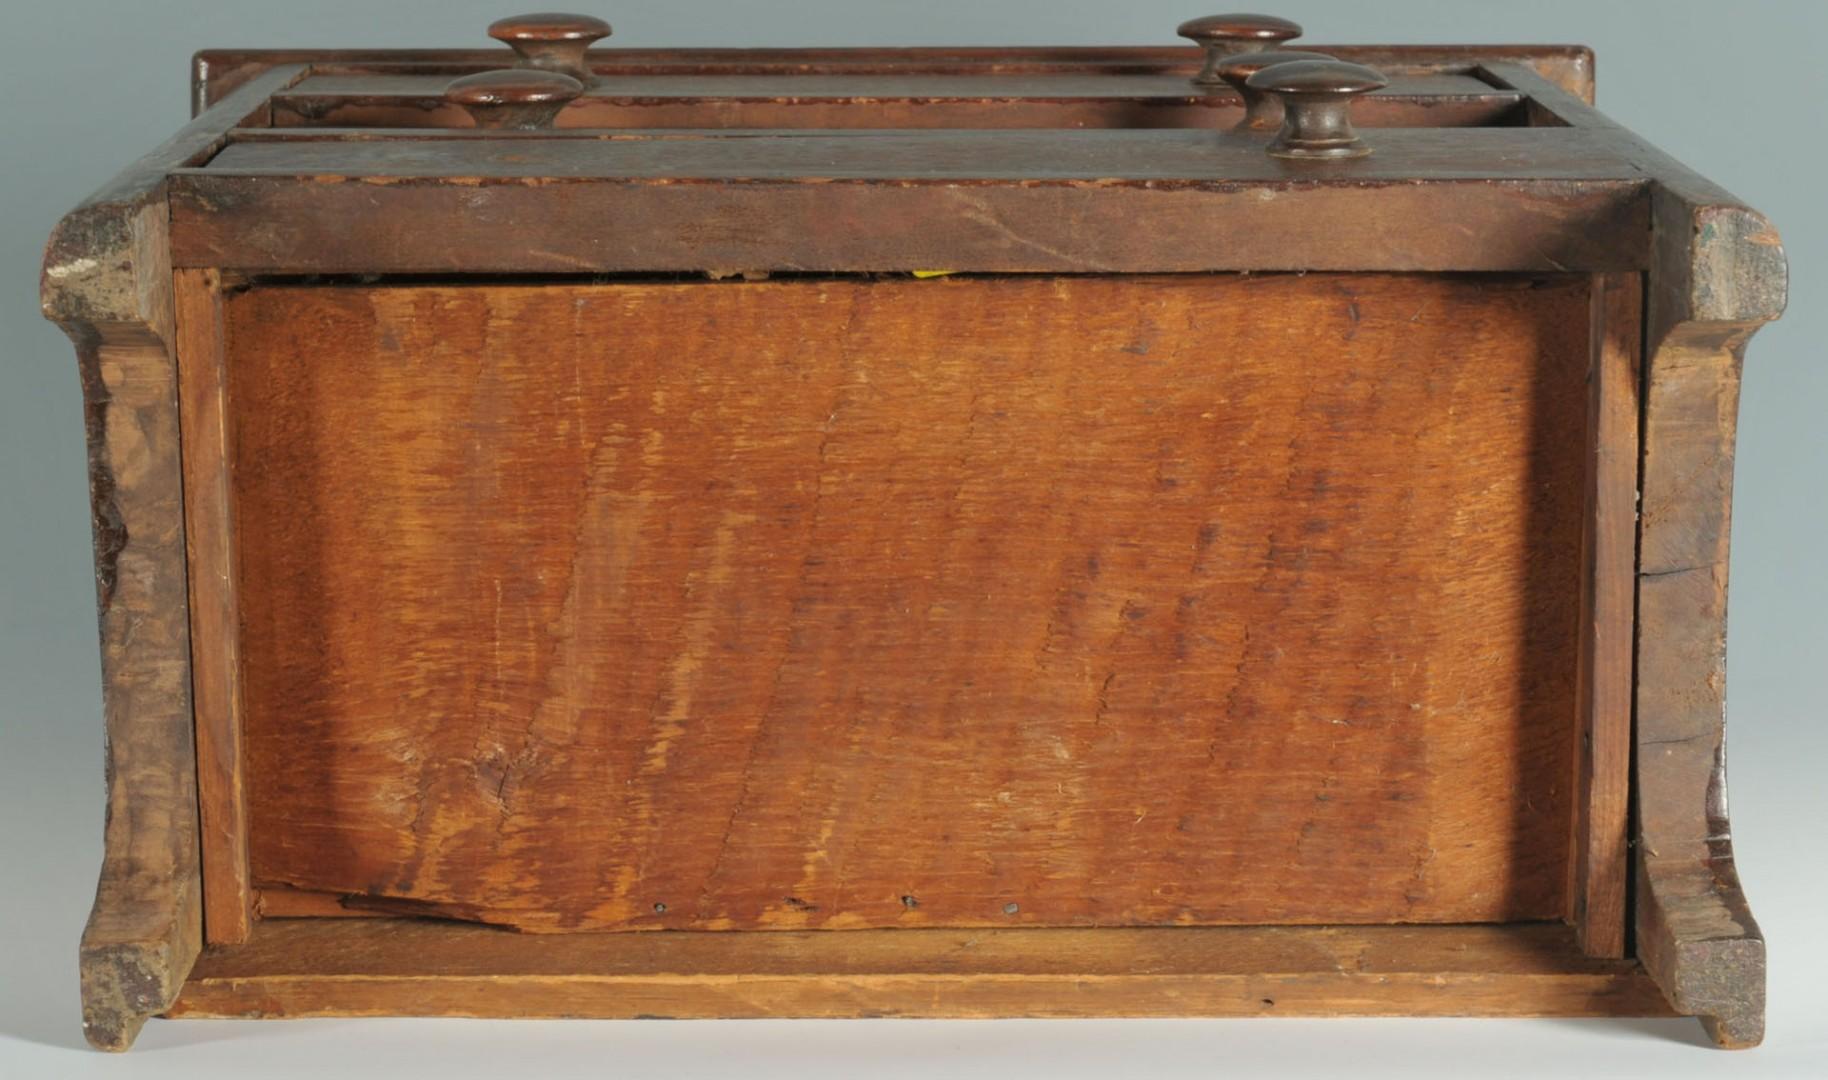 Miniature three-drawer chest